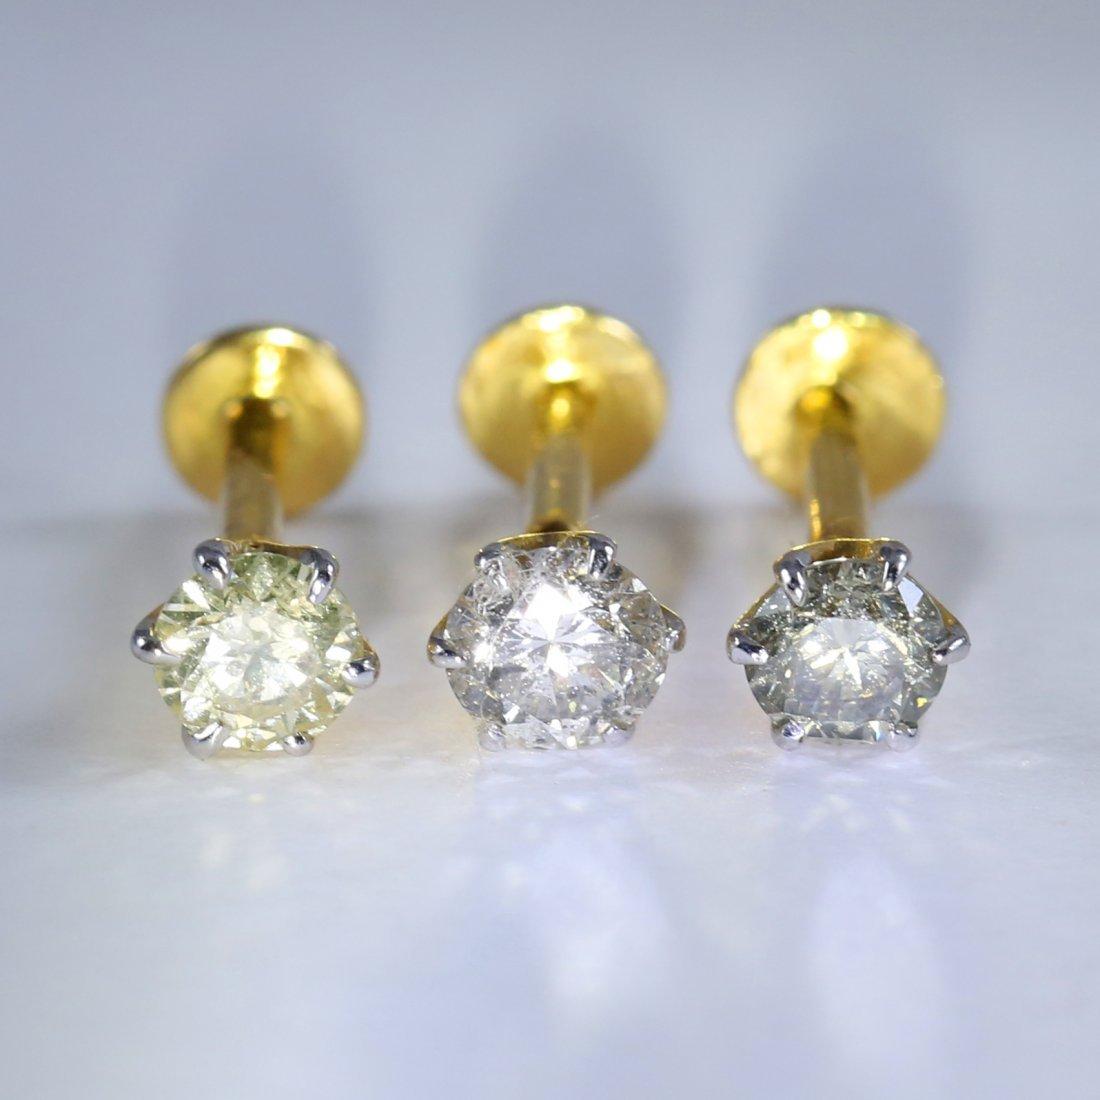 14 K Set of 3 Yellow Gold Diamond Ear Studs/Nose Ring